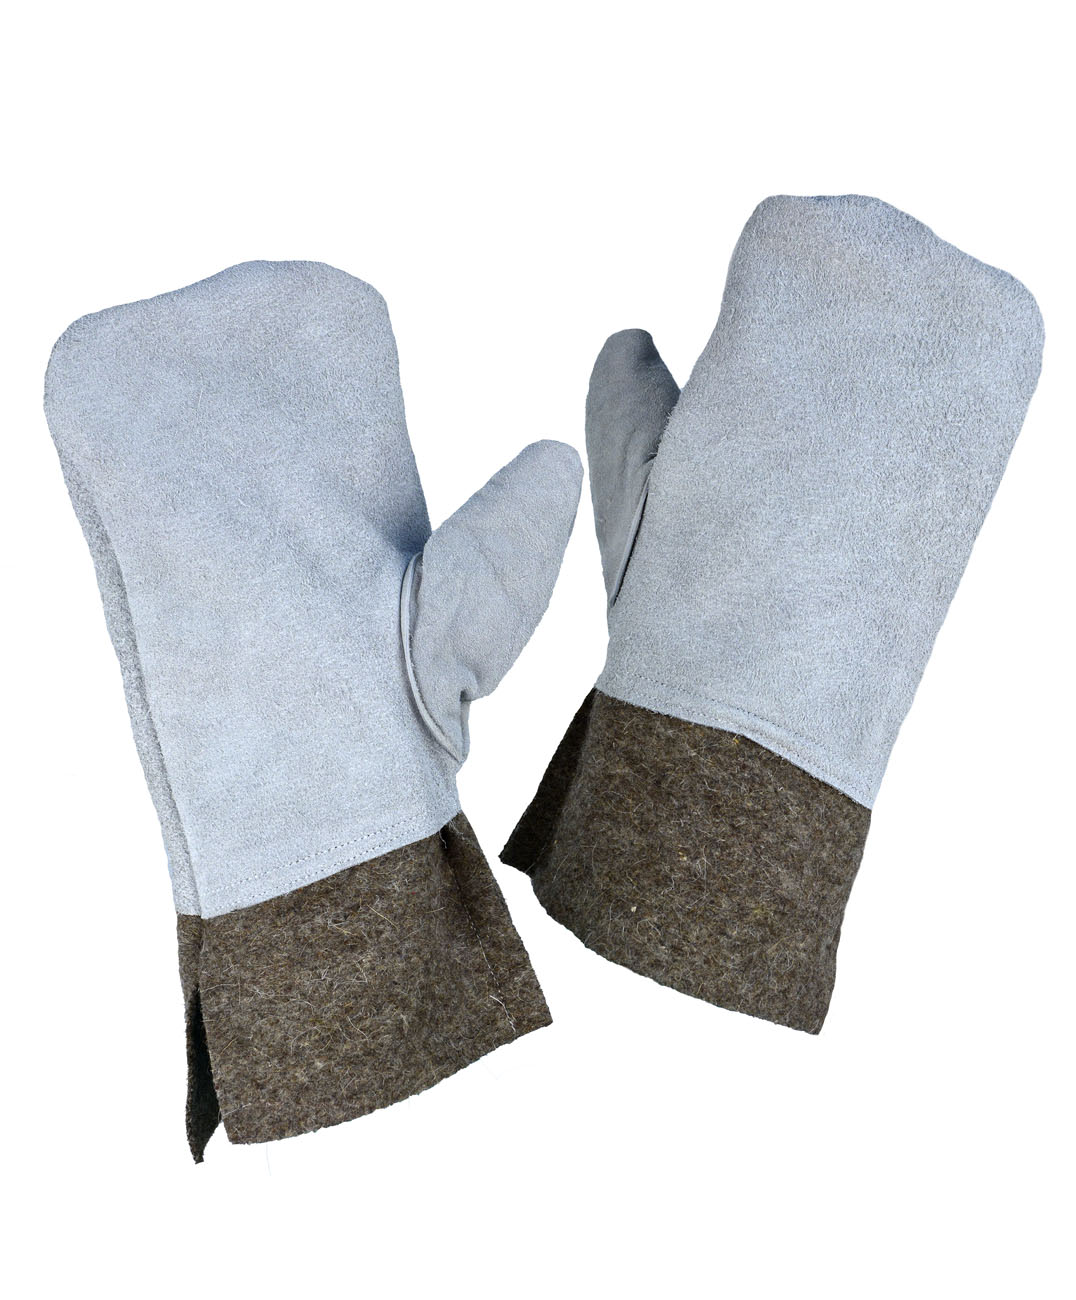 Вачеги для металлурга сукно - спилок (50 пар в уп.)